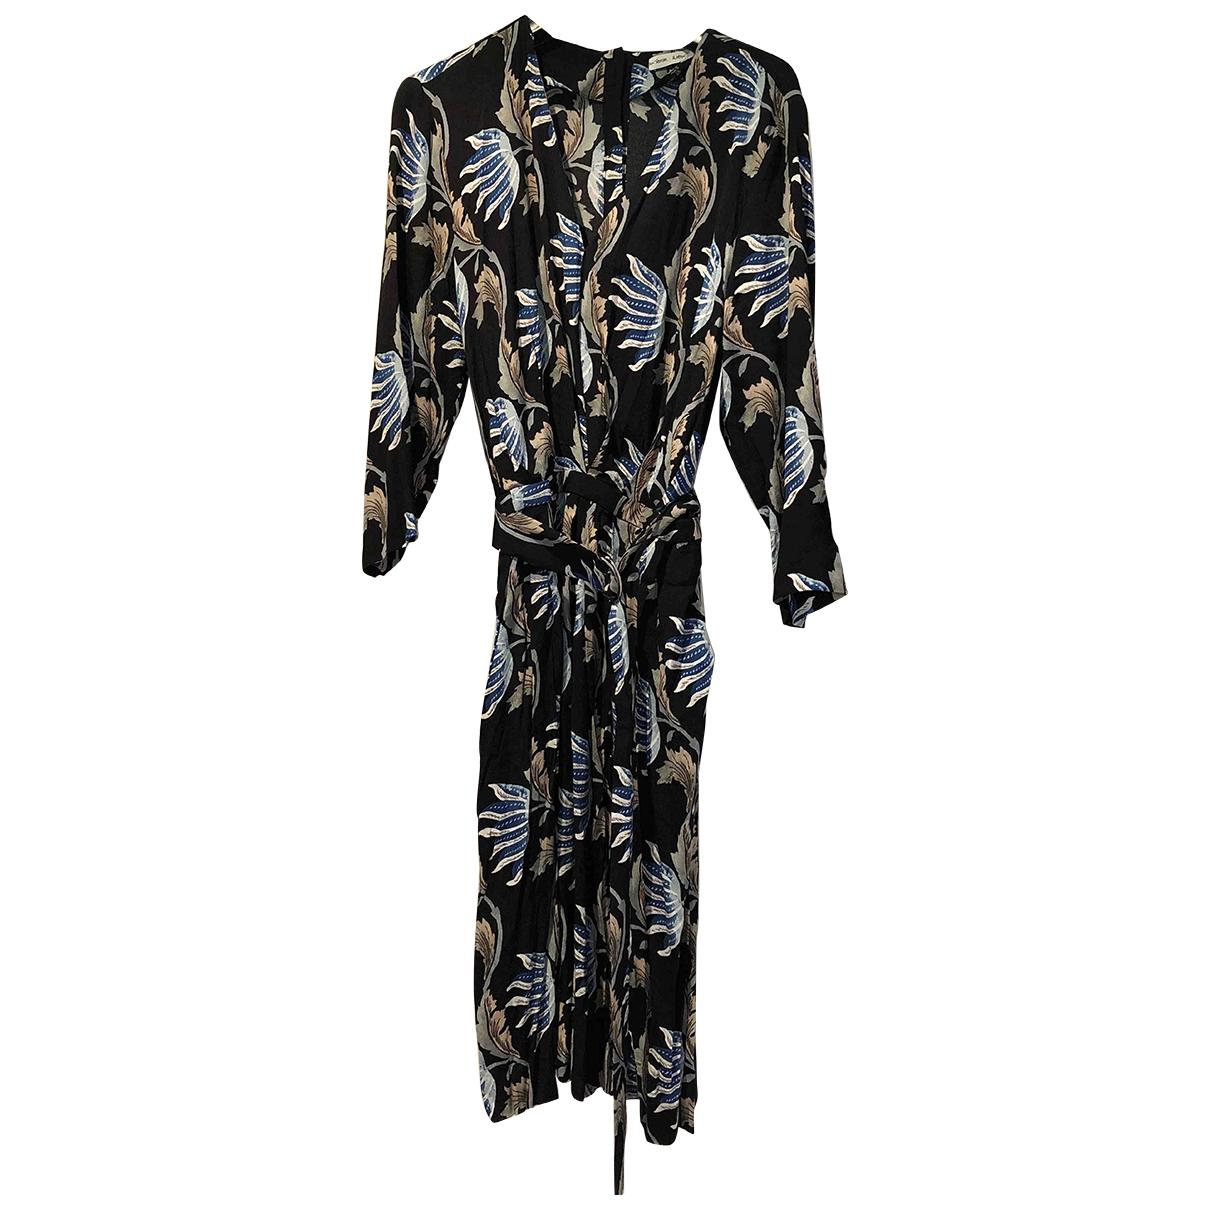 & Stories \N Multicolour dress for Women 8 US